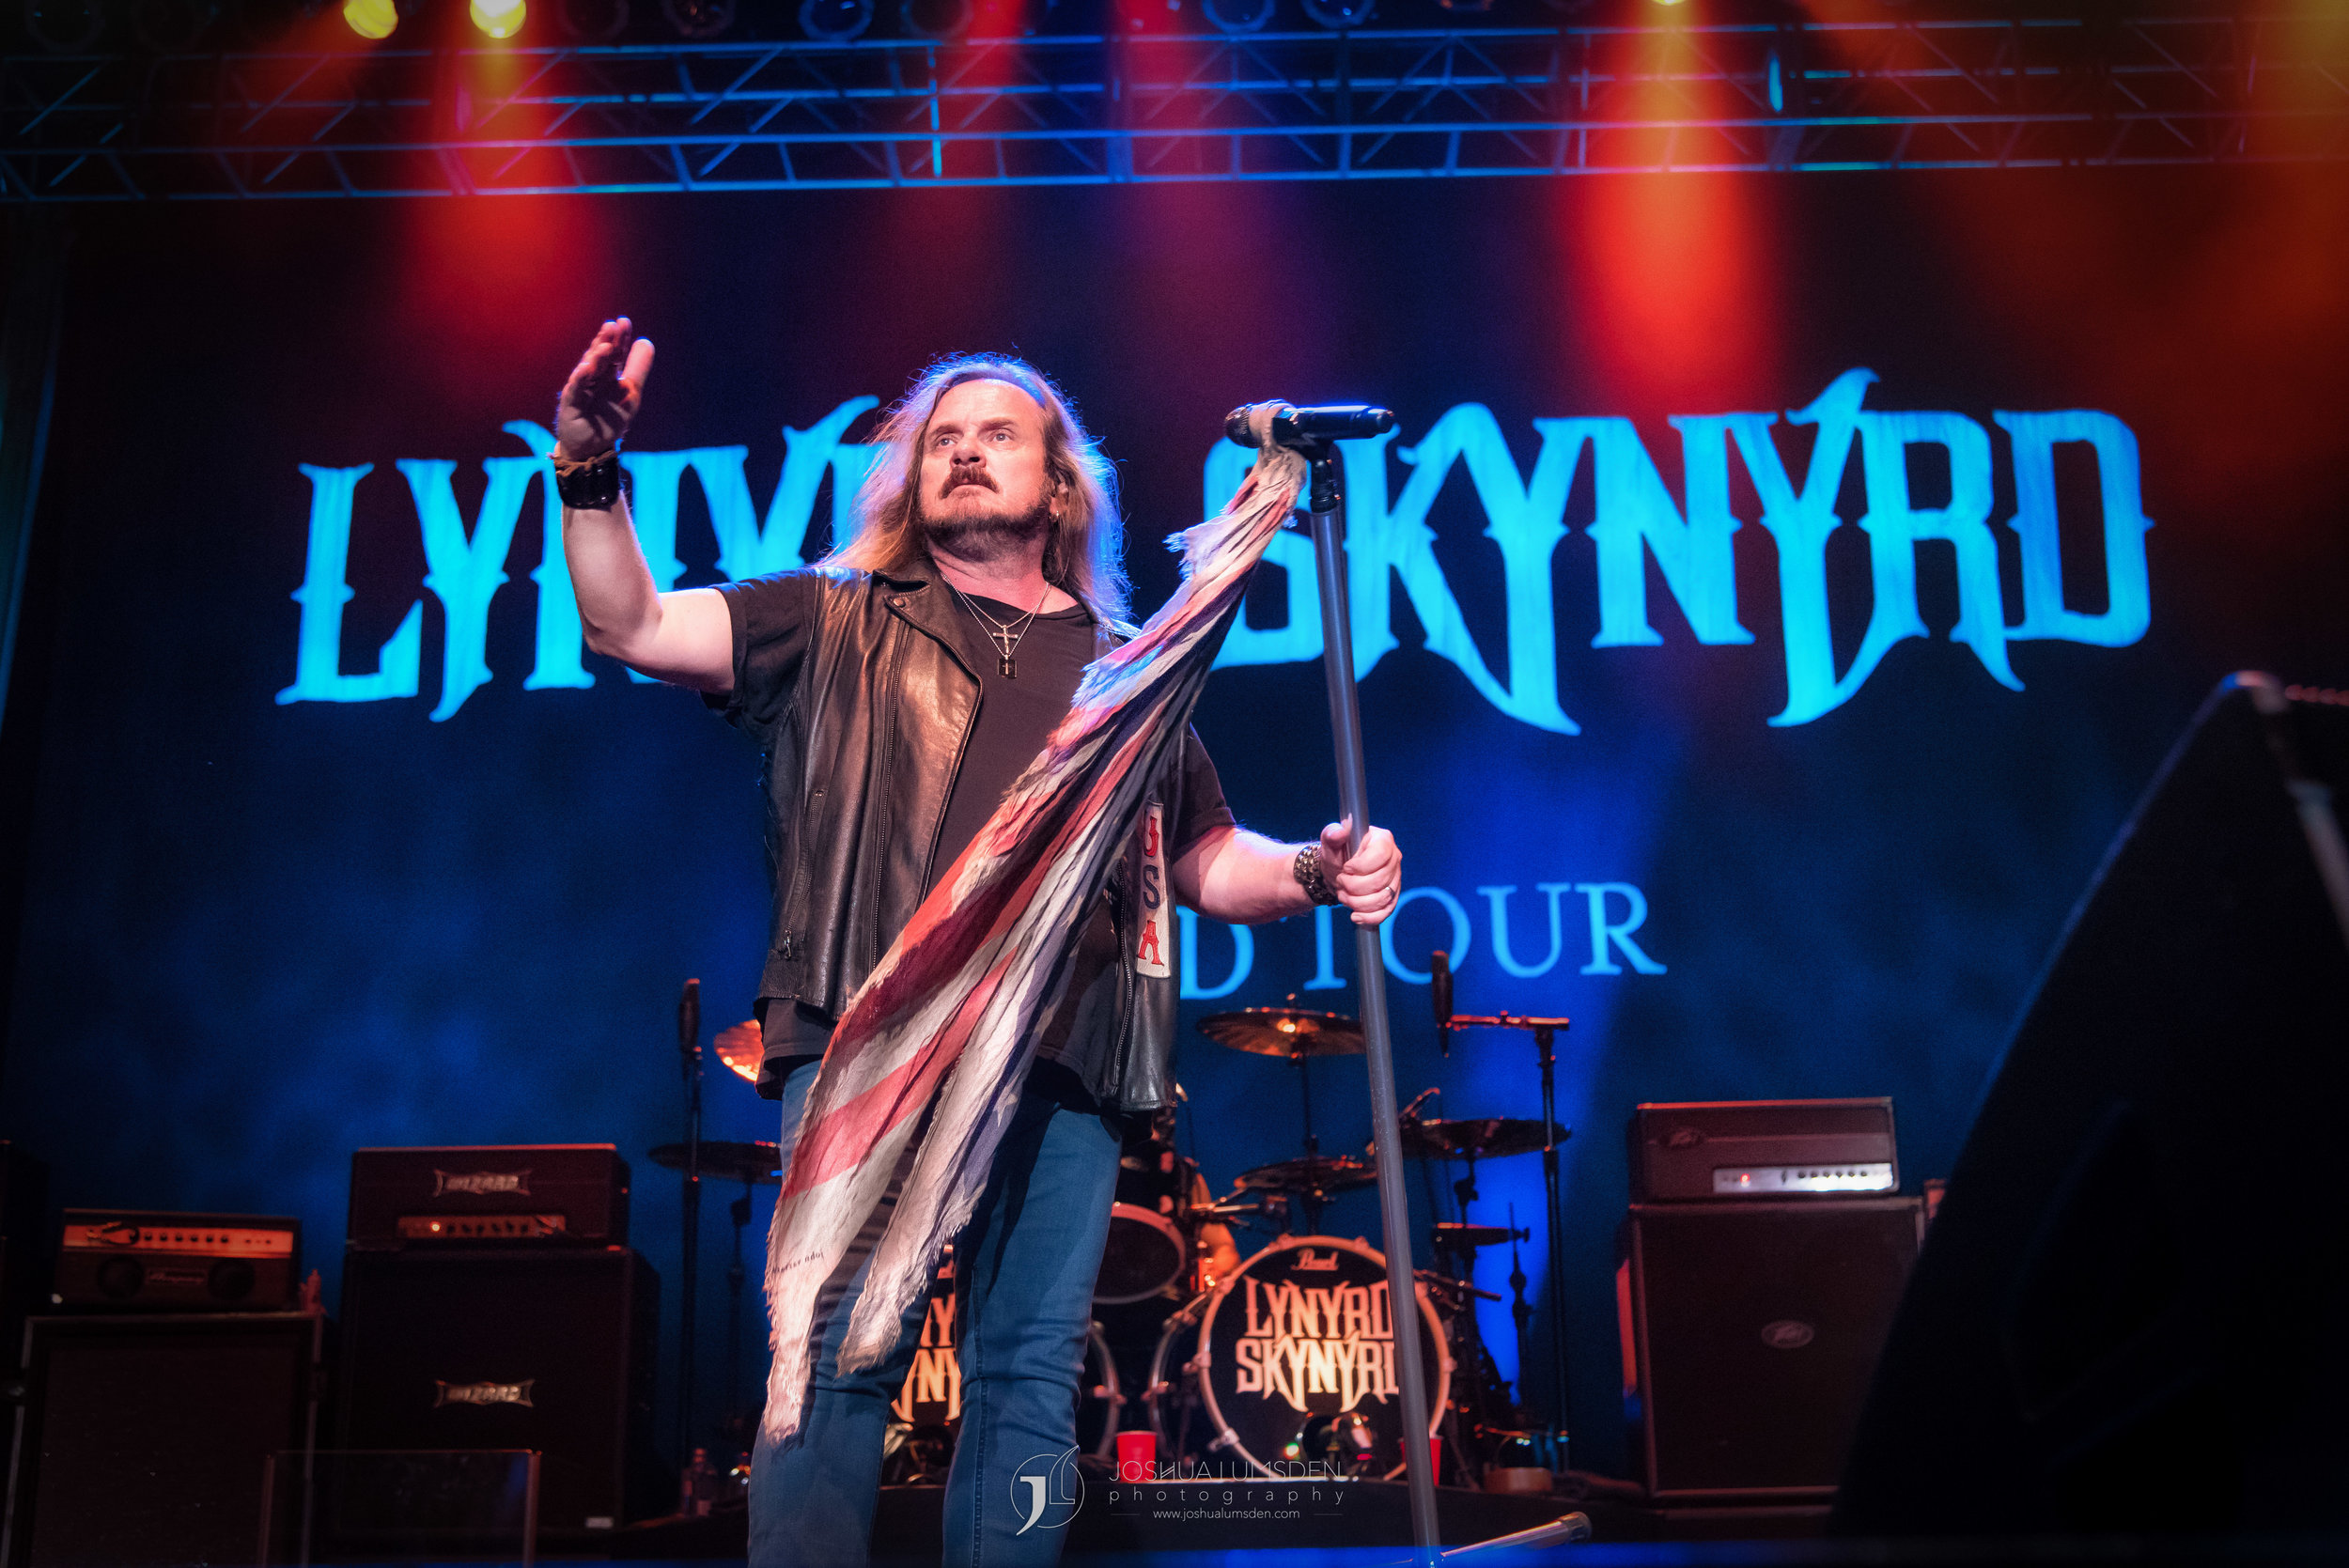 Lynyrd Skynyrd - 6/18/2016 | Verizon Wireless Amphitheatre | Duluth, Ga